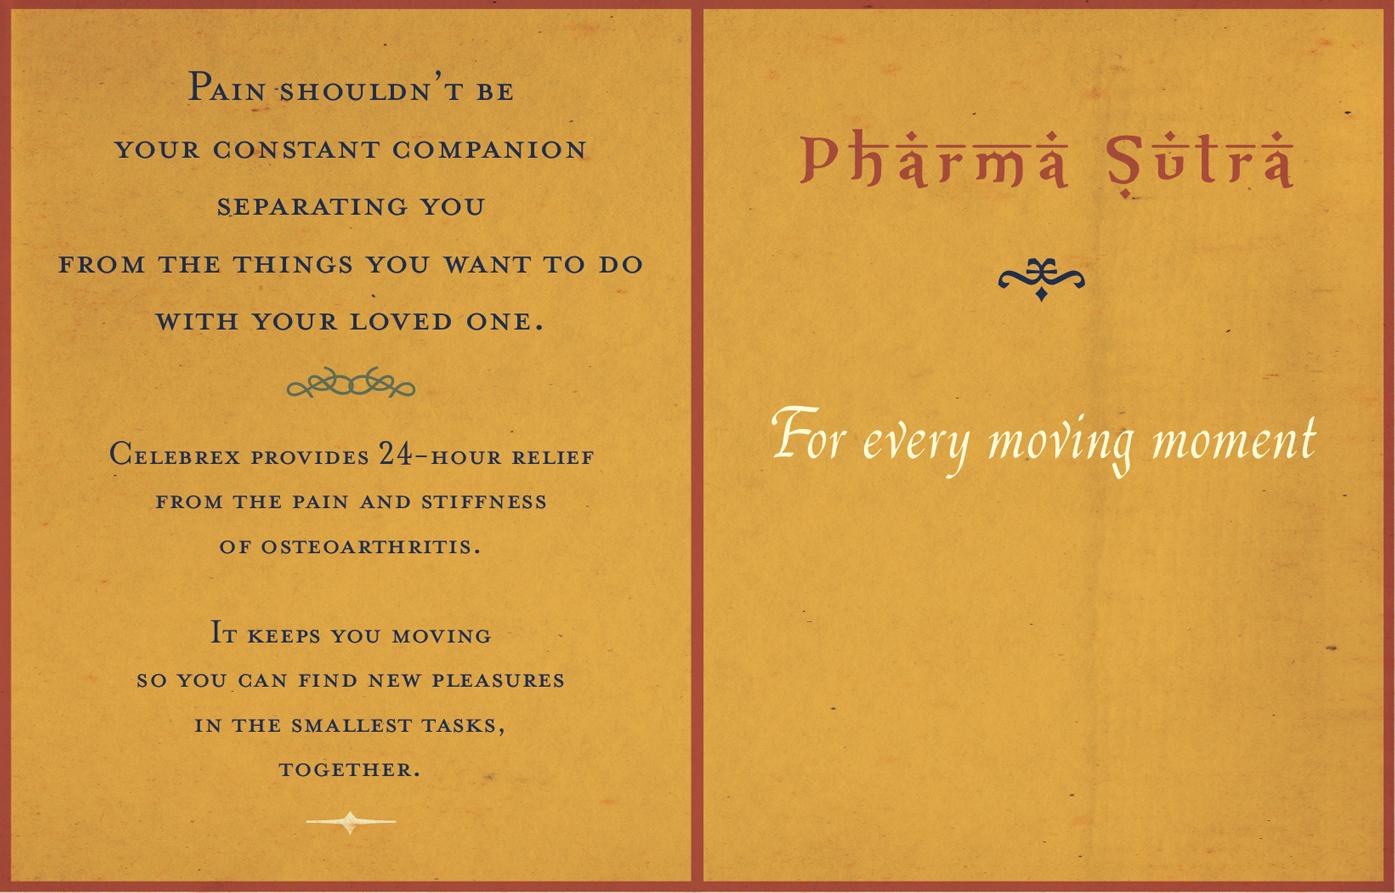 pharma-FINAL-book-spread-1.jpg